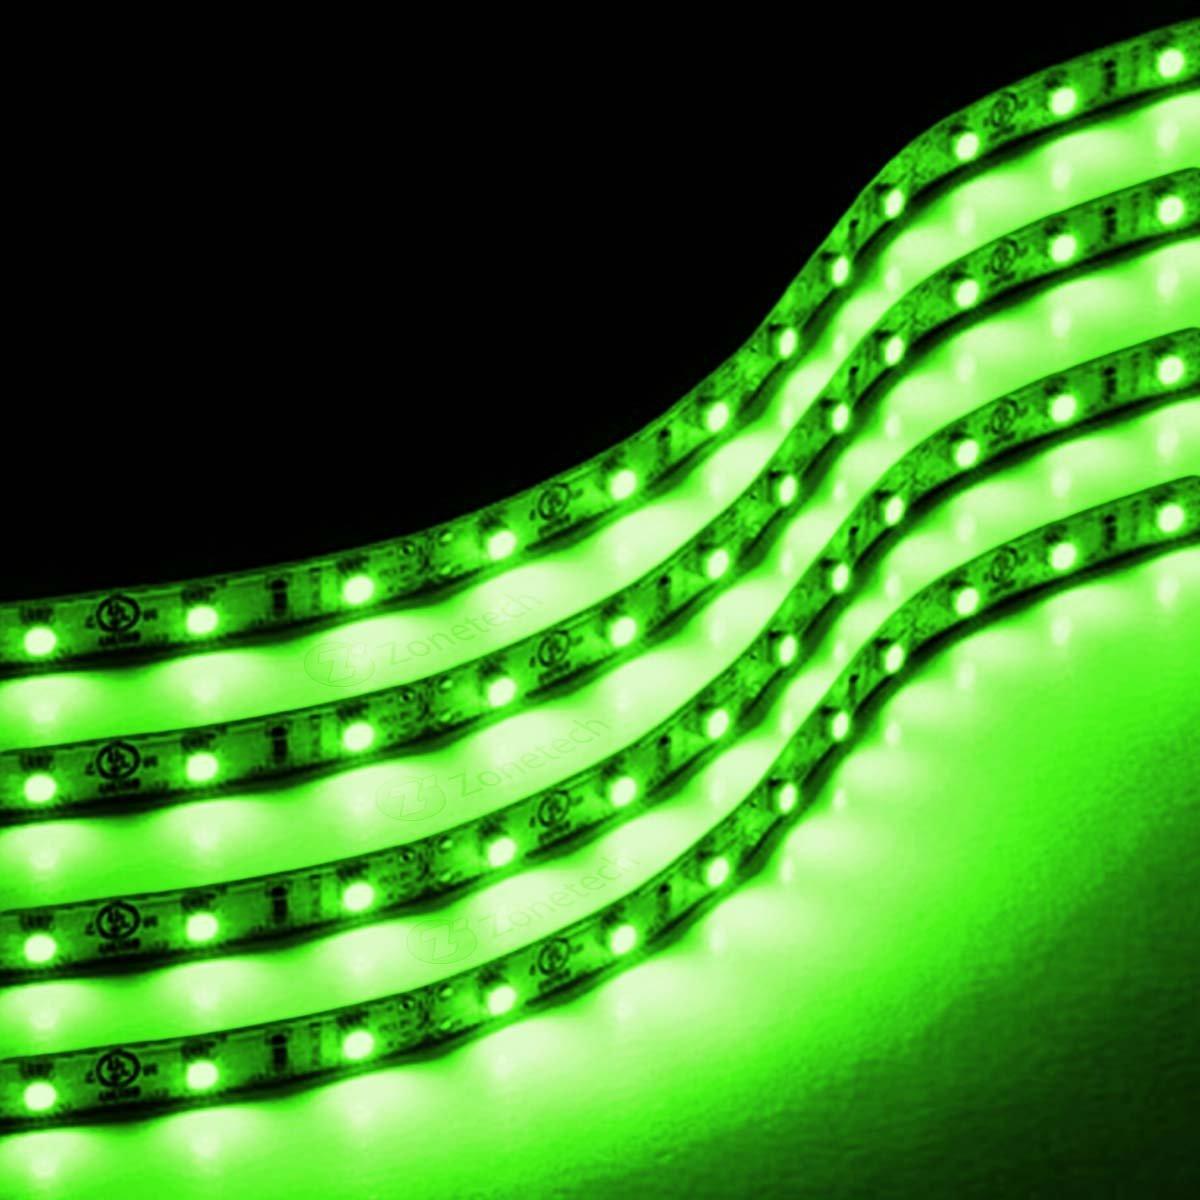 Zone Tech 4x Green 30cm LED Car Flexible Waterproof Lighting Light Str